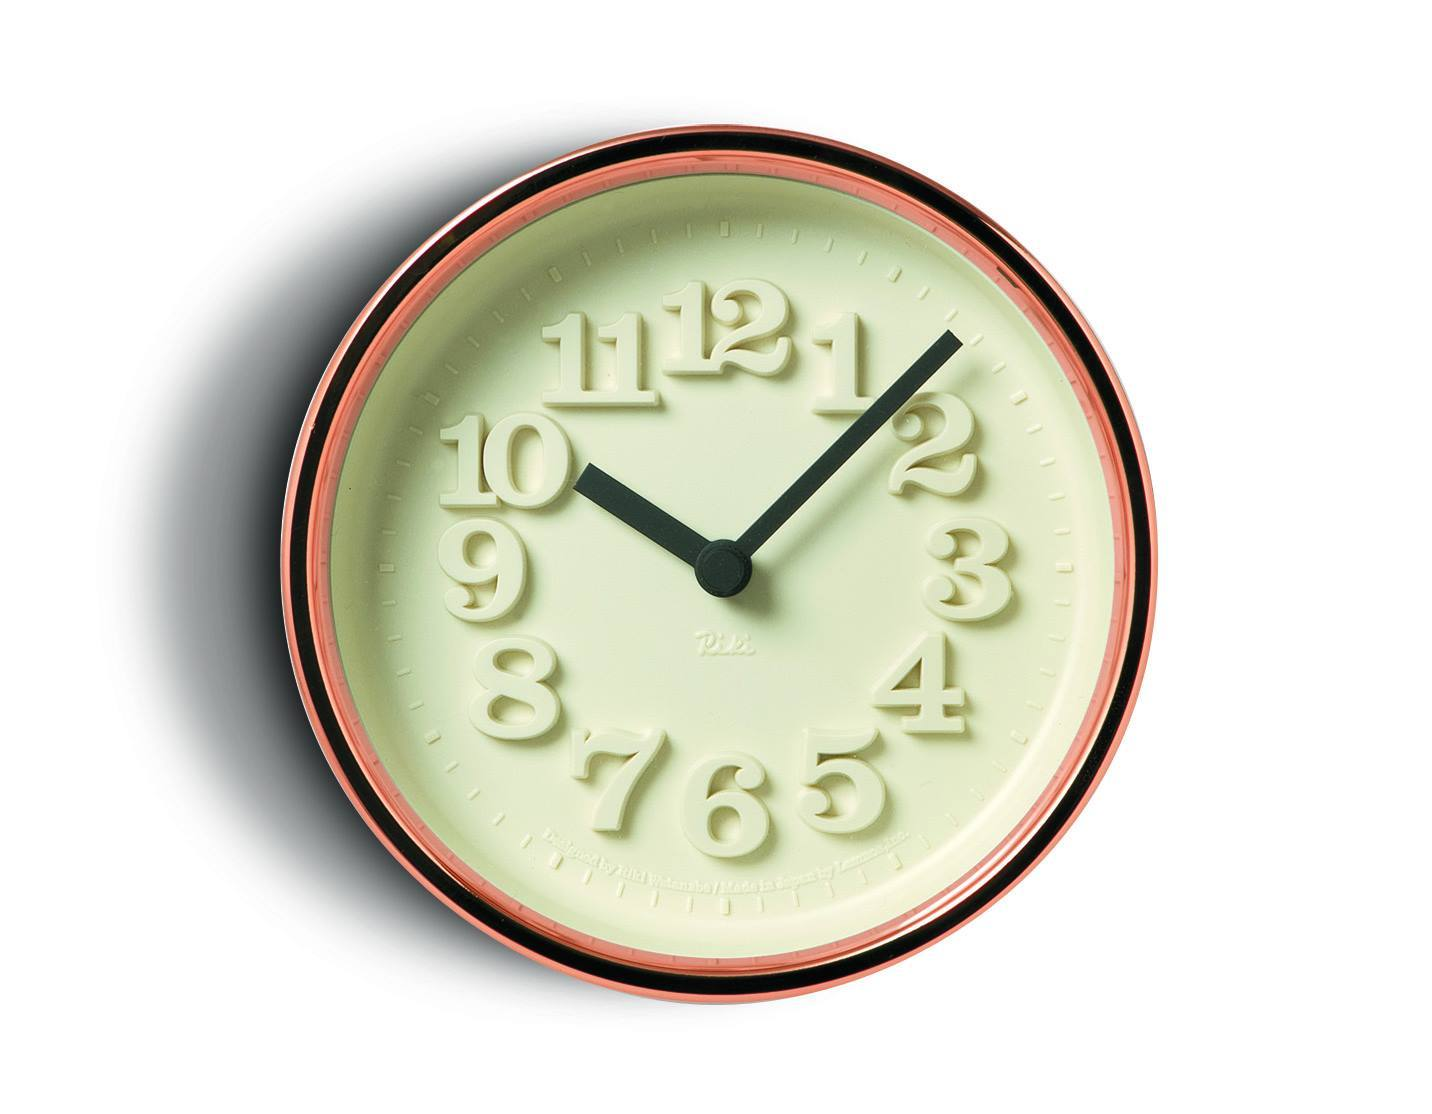 2019 X'mas GIFT Vol.7...渡辺力がもっとも愛する金属であった銅を用いた時計の名作。_b0125570_16041025.jpg